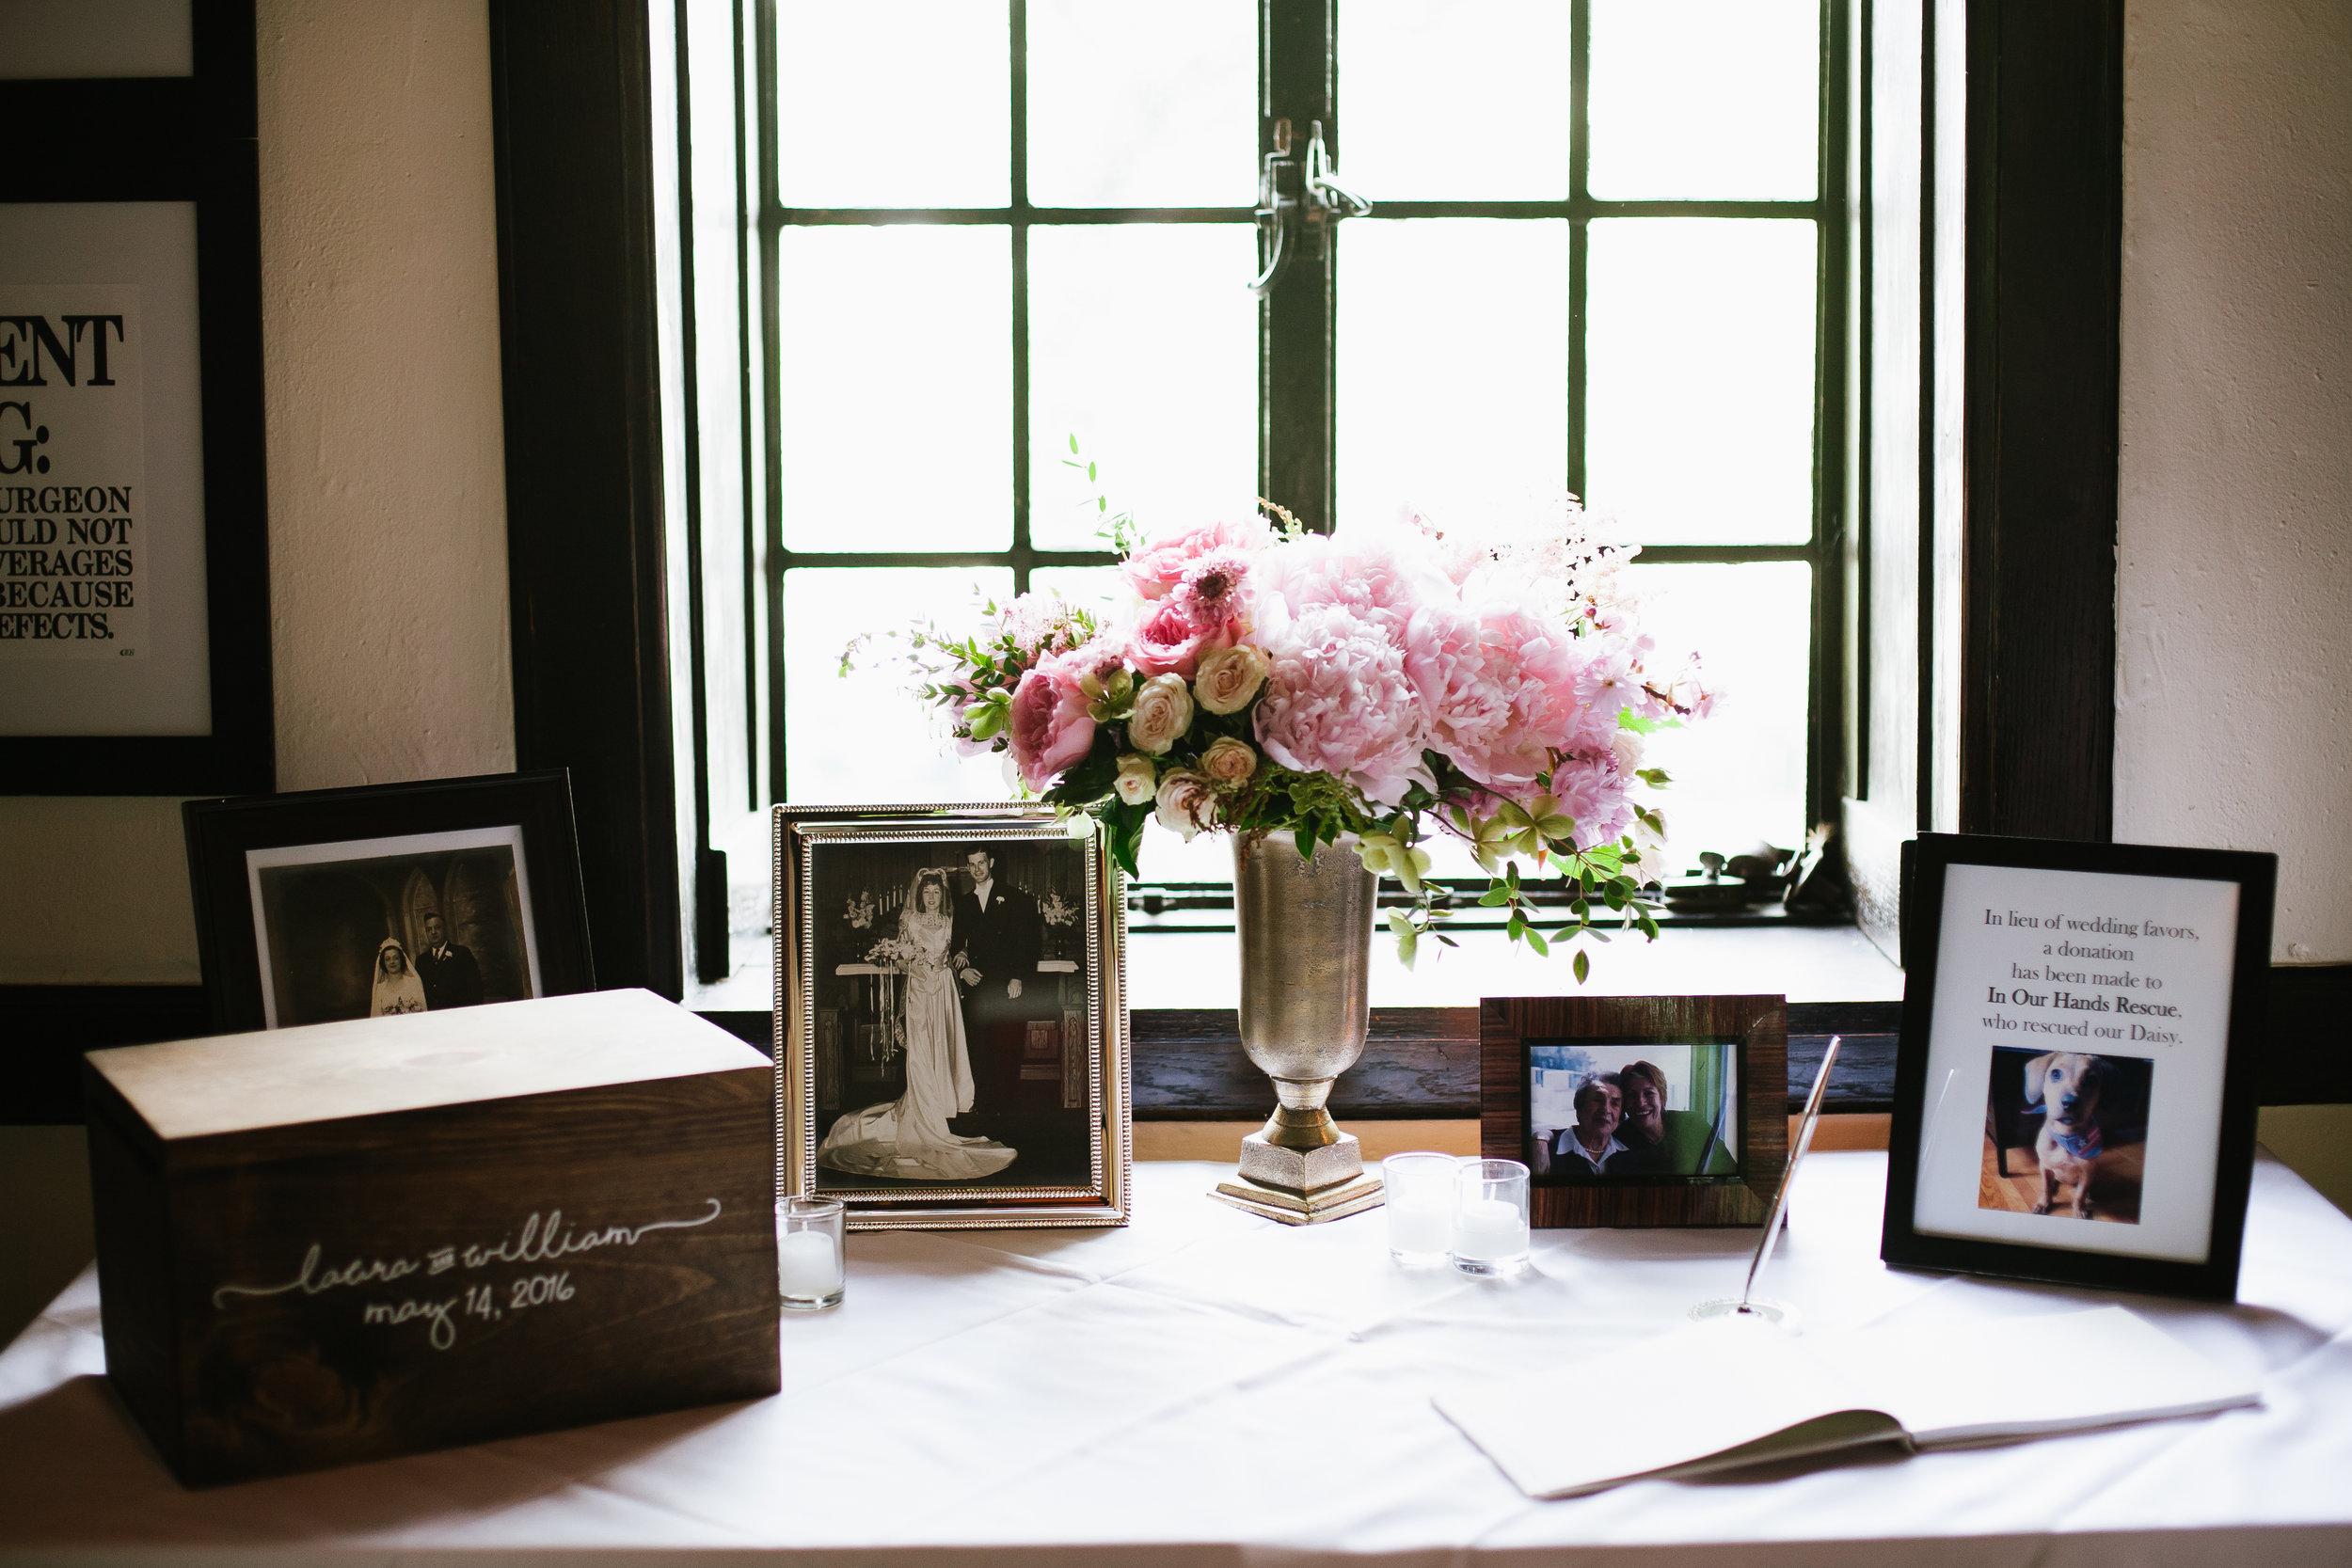 martha stewart weddings - Making a Donation in Lieu of wedding Favors